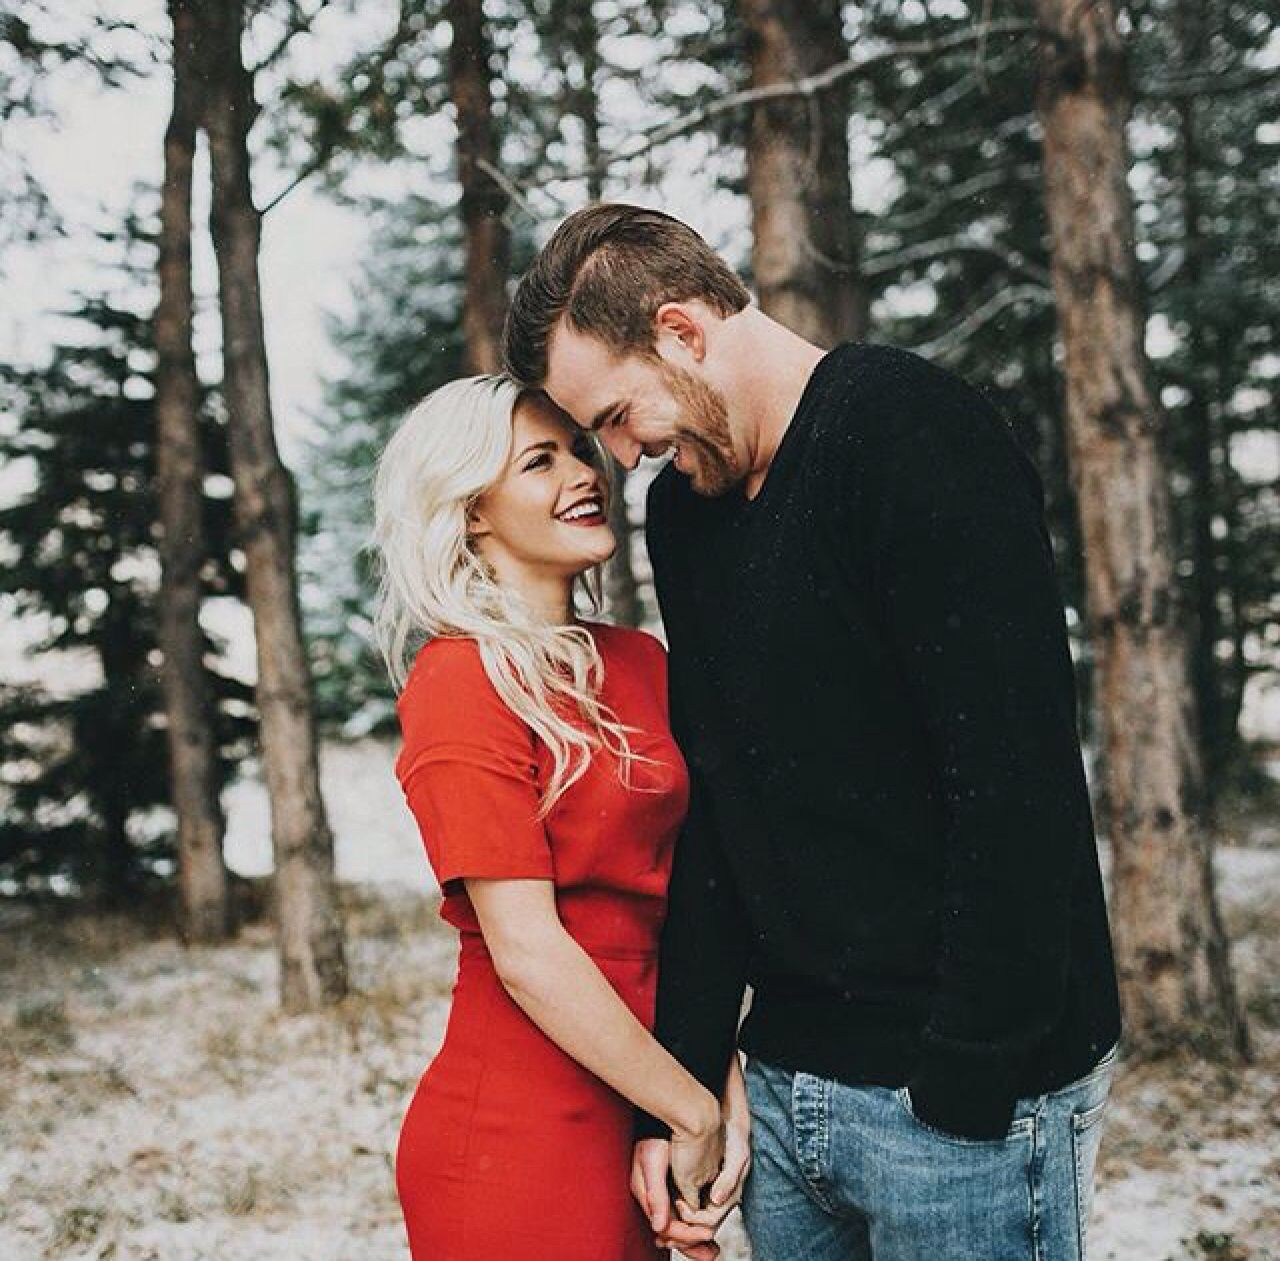 Whitney Carson Wedding Hair Style: Engagement Photos, Christmas Couple